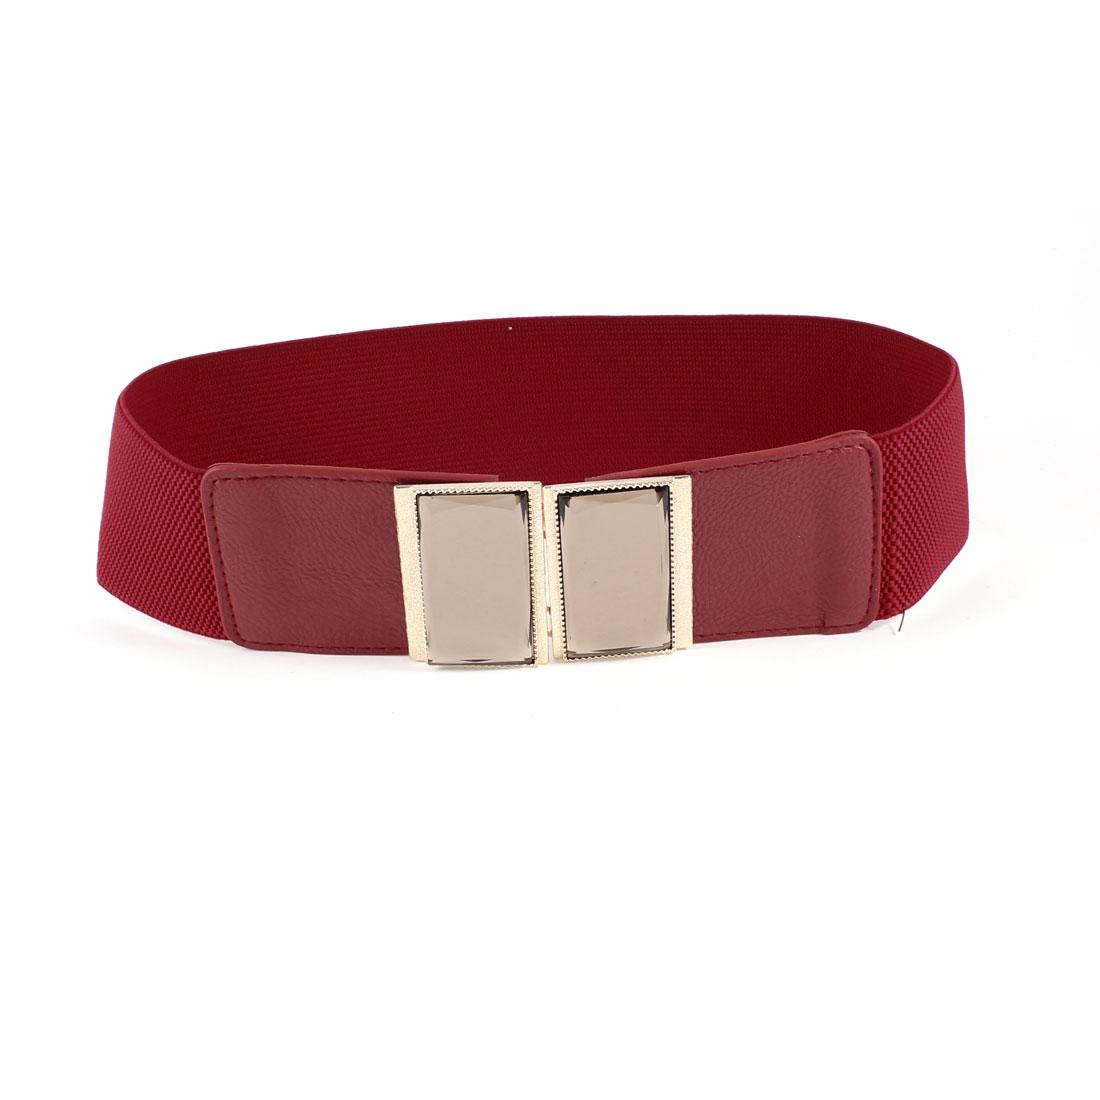 Women Plastic Crystal Accent Interlocking Buckle Stretchy Waist Belt Red